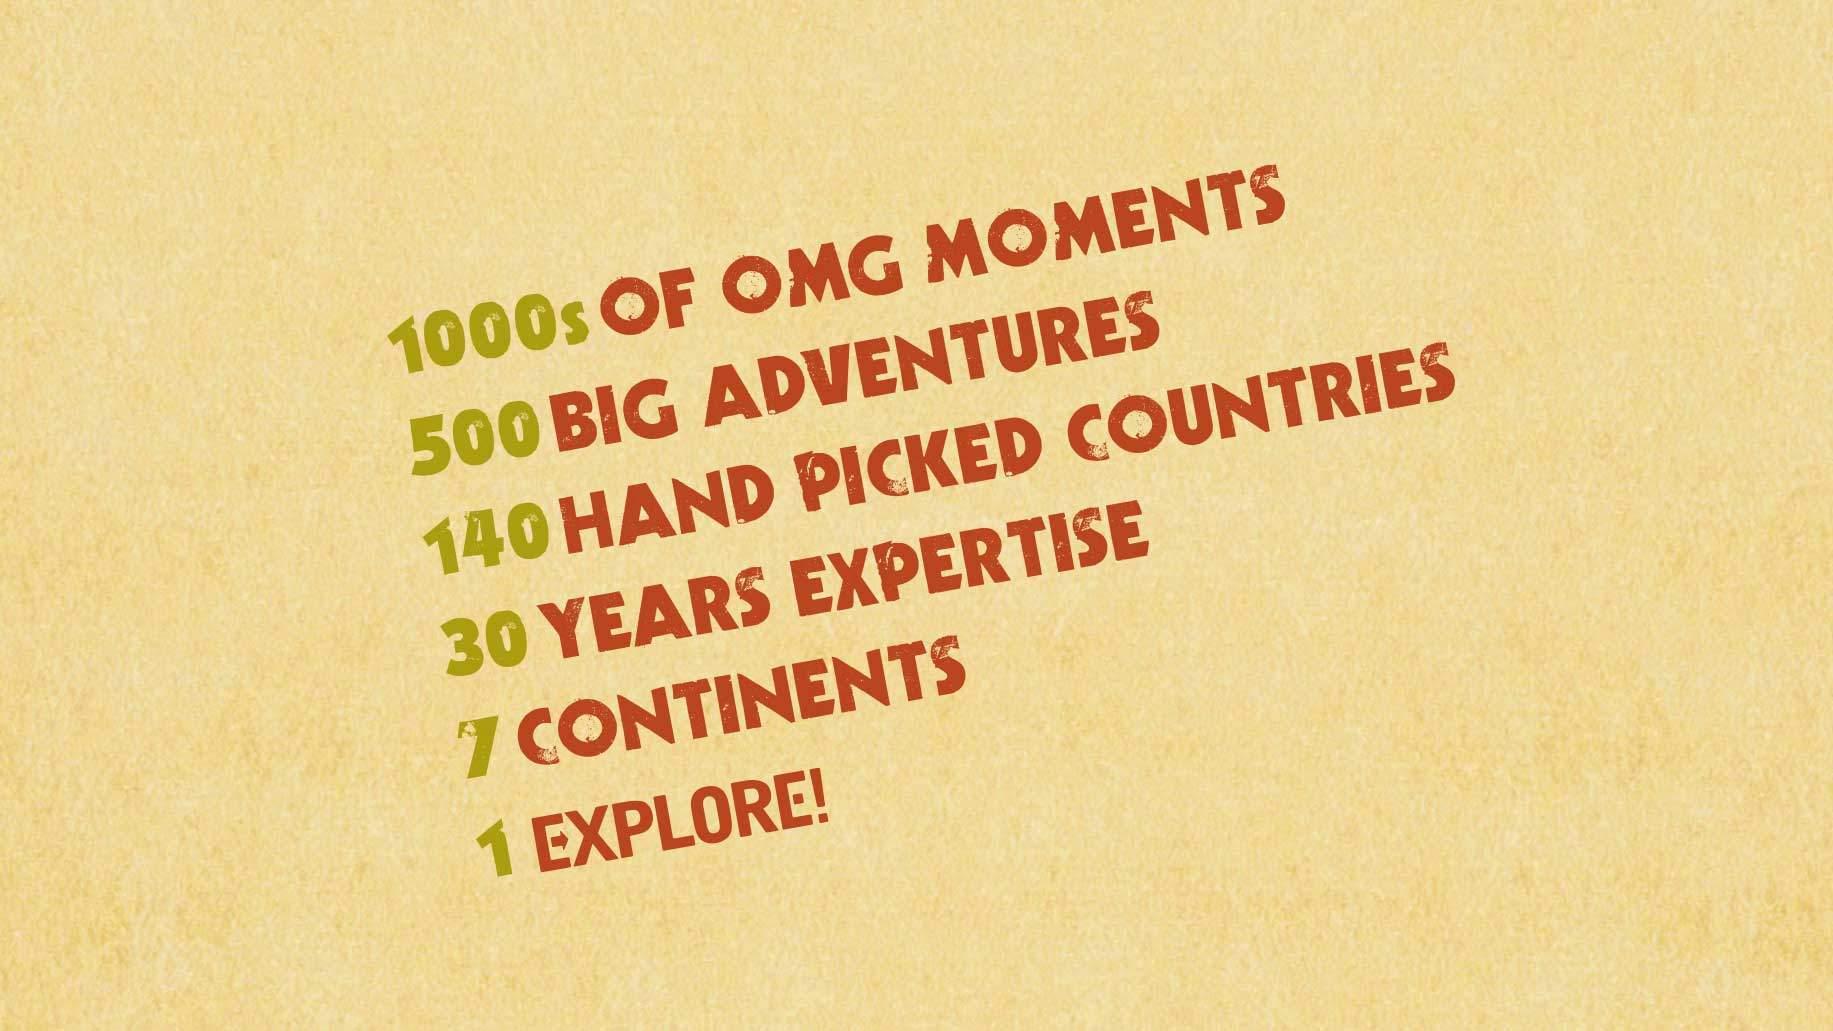 adventure travel brochure design back cover omg marketing campaign